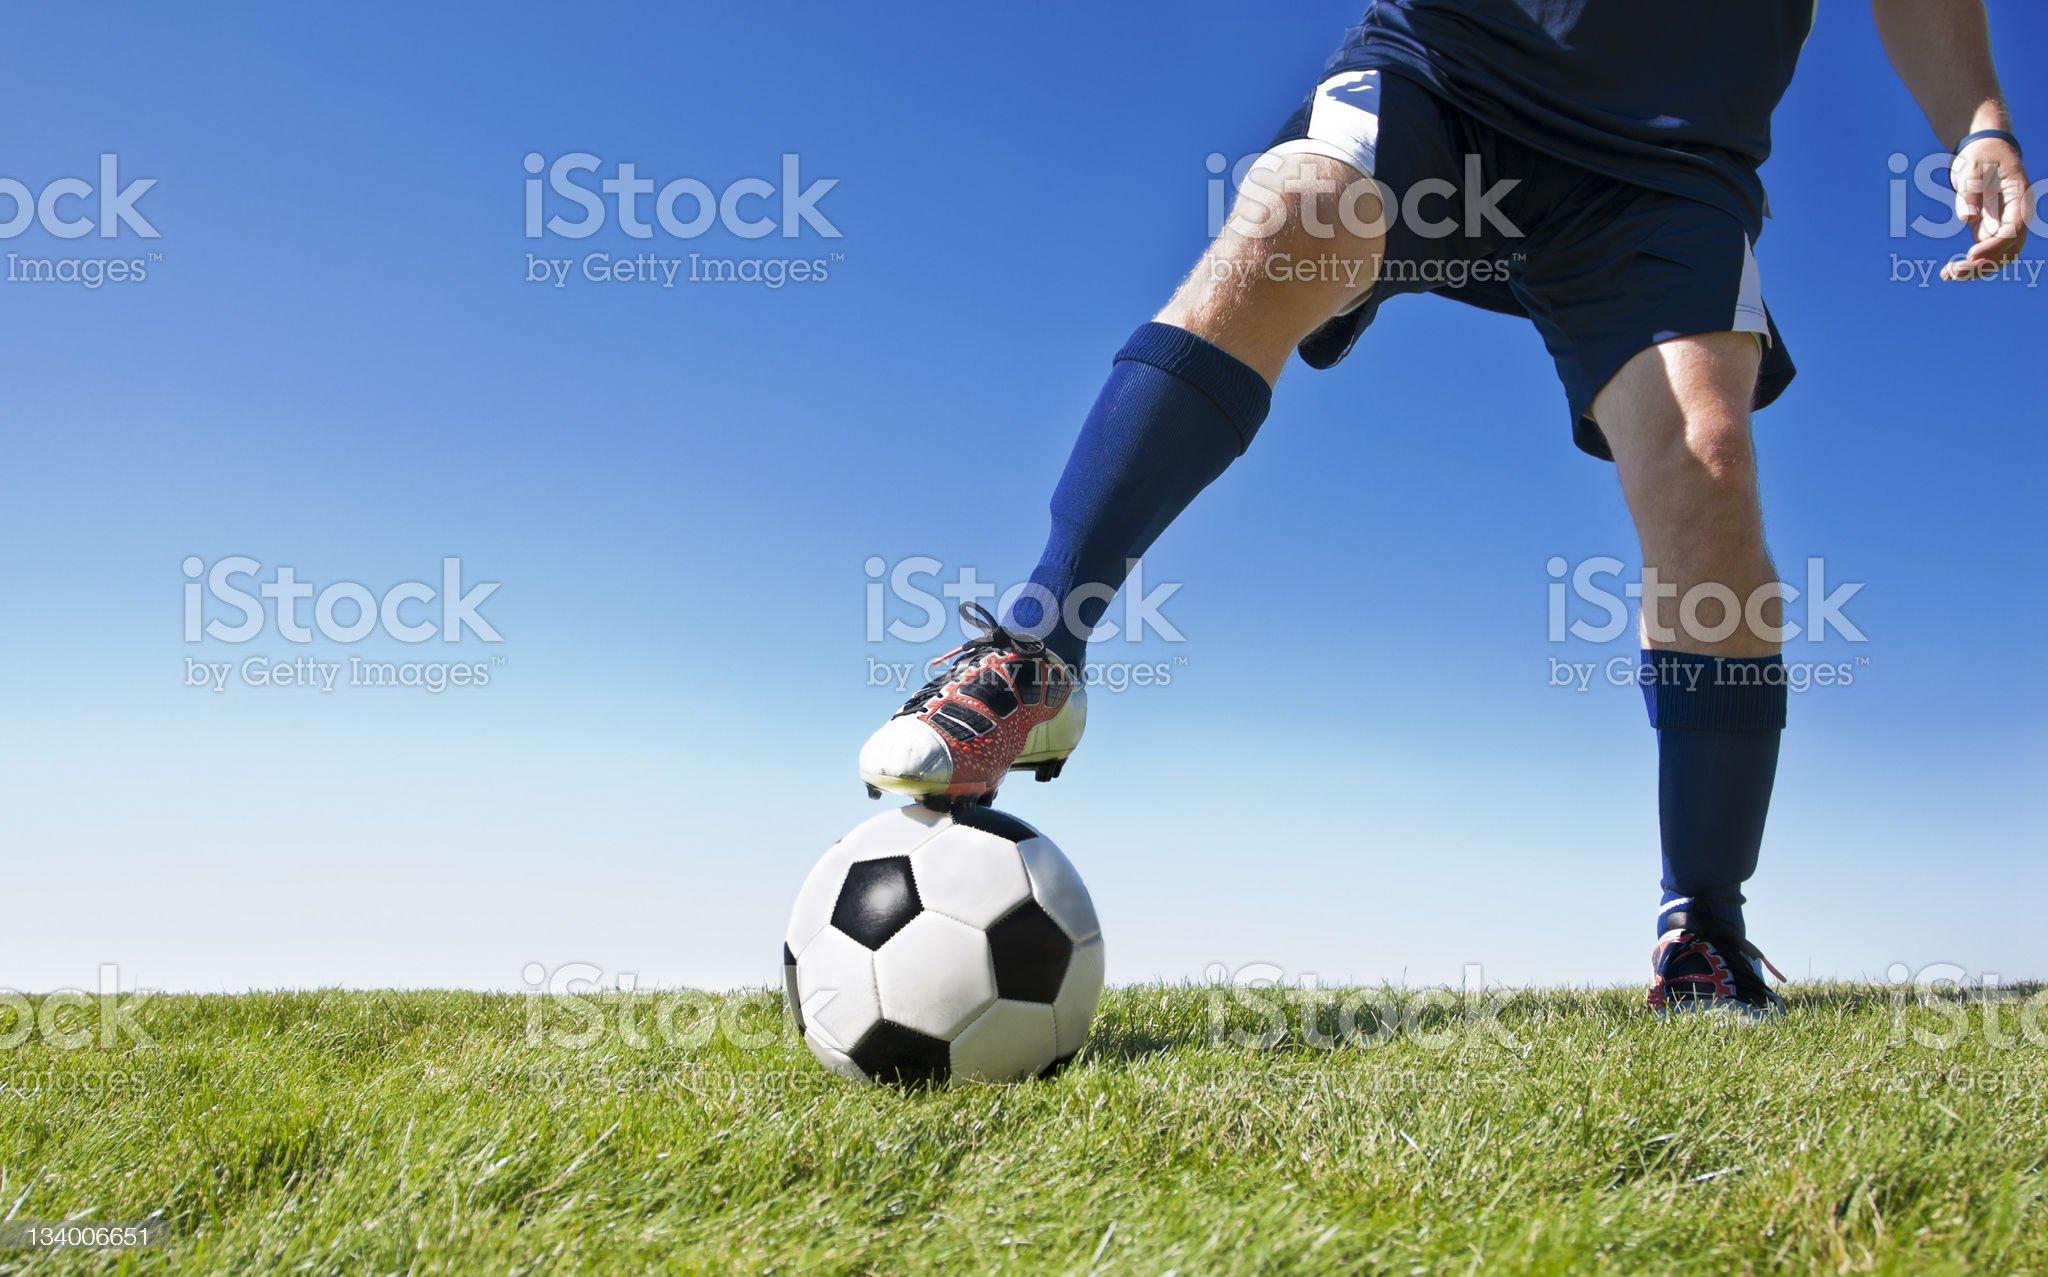 Kicking the soccer ball - Horizontal royalty-free stock photo